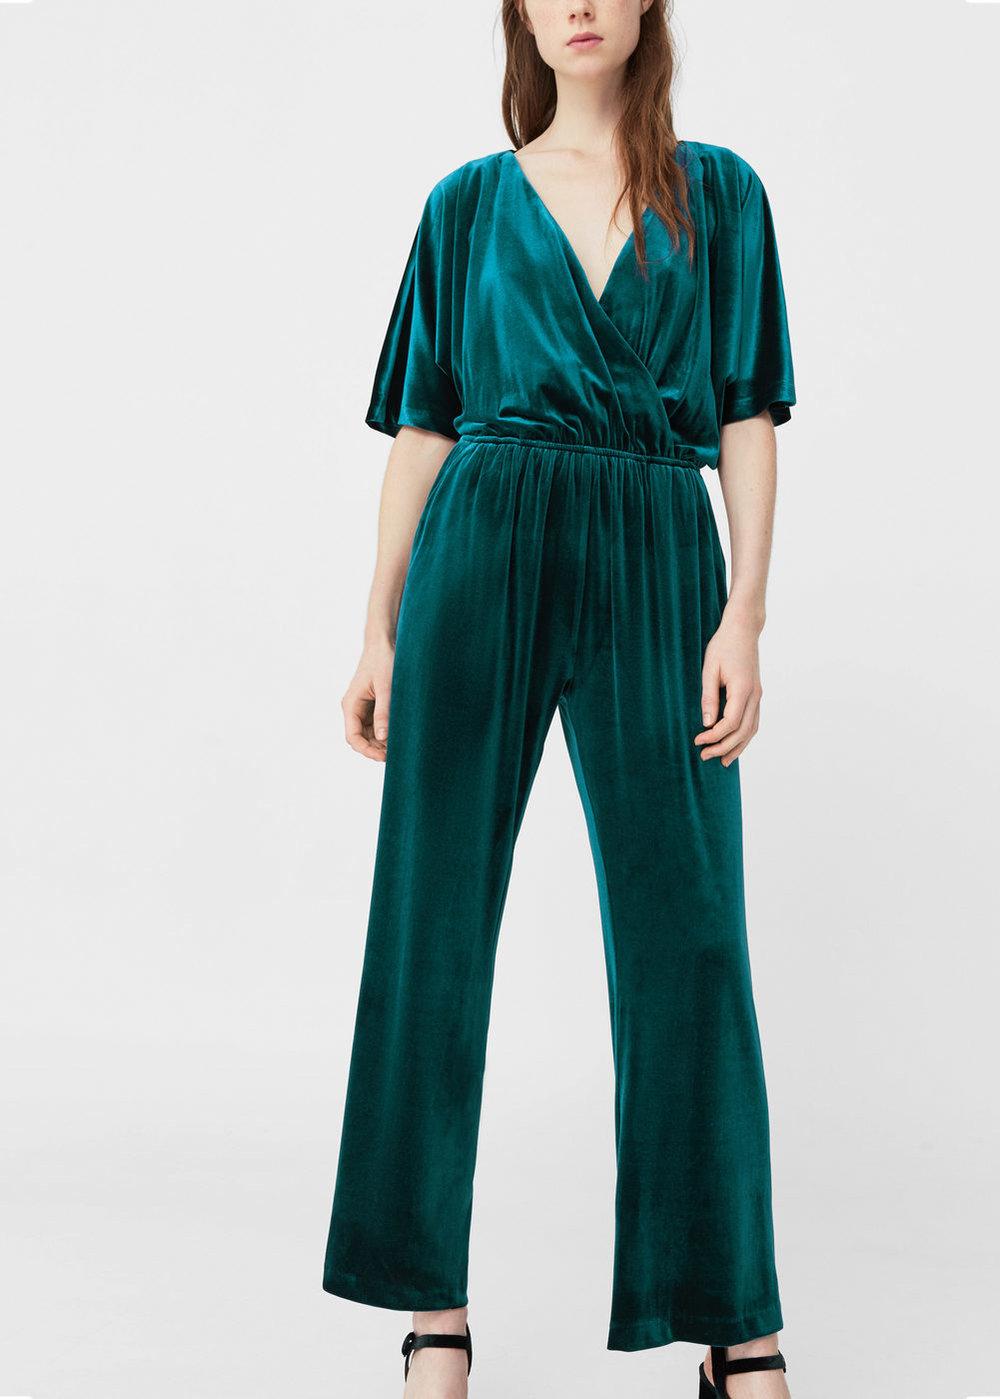 Velvet jumpsuit, £49.99, Mango